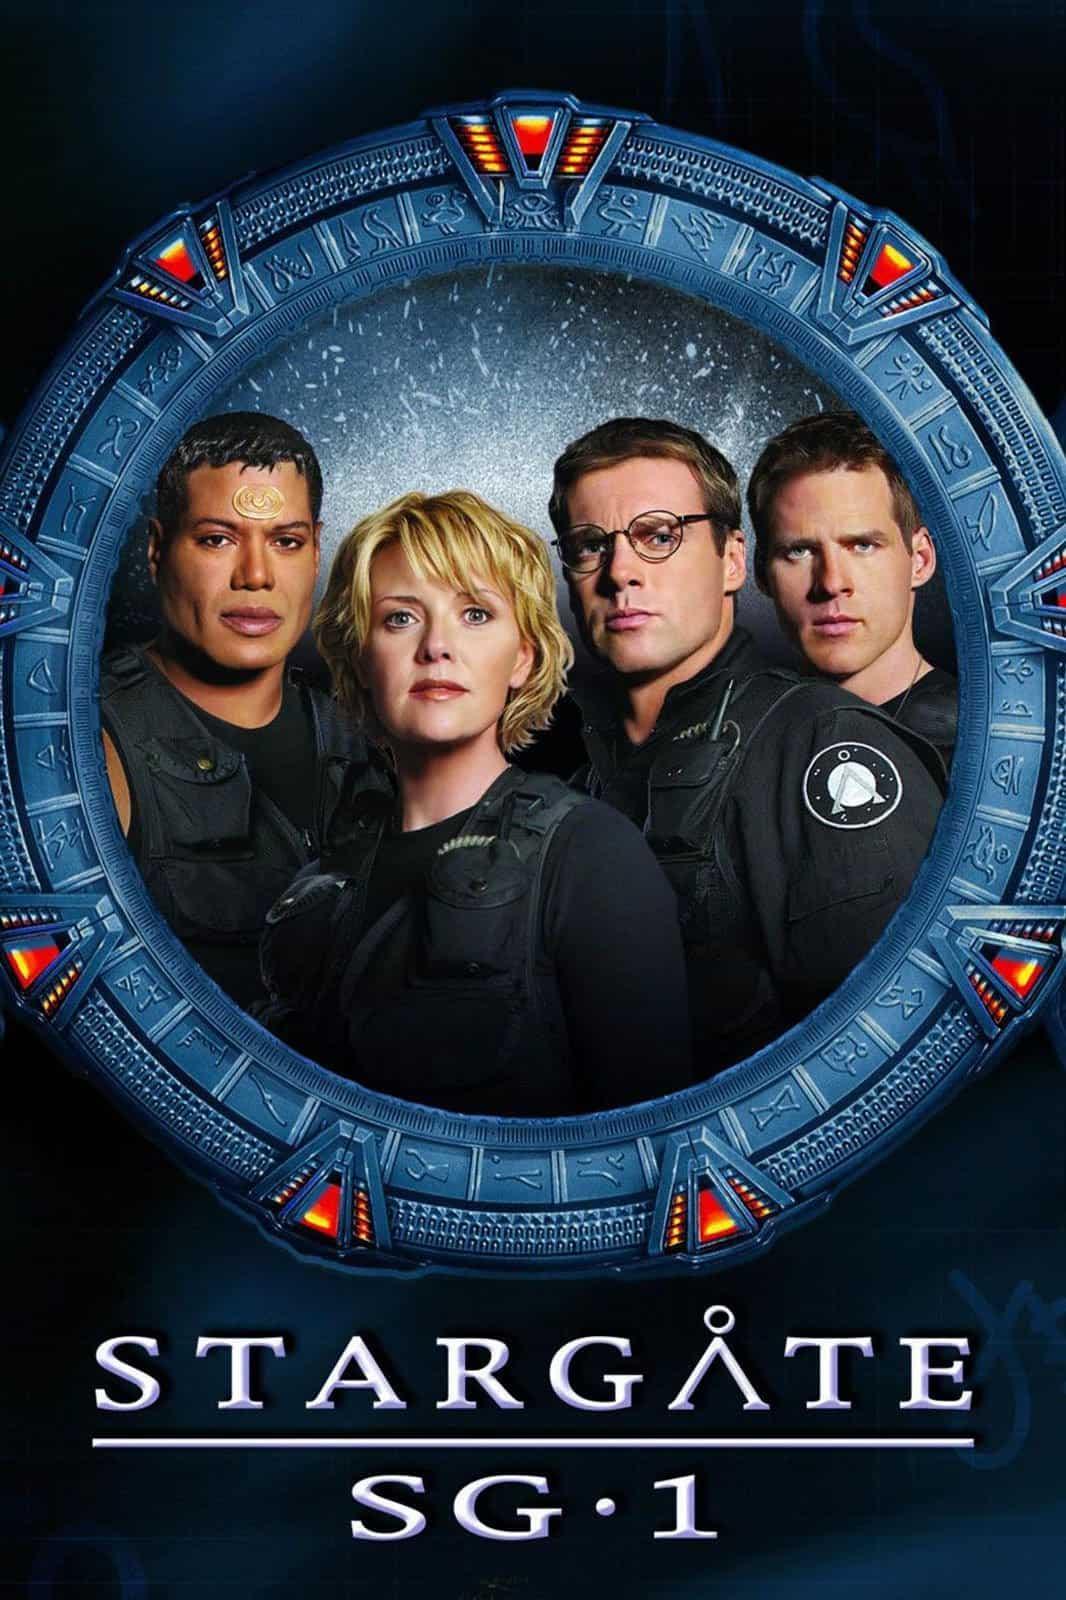 Stargate SG-1, 1997